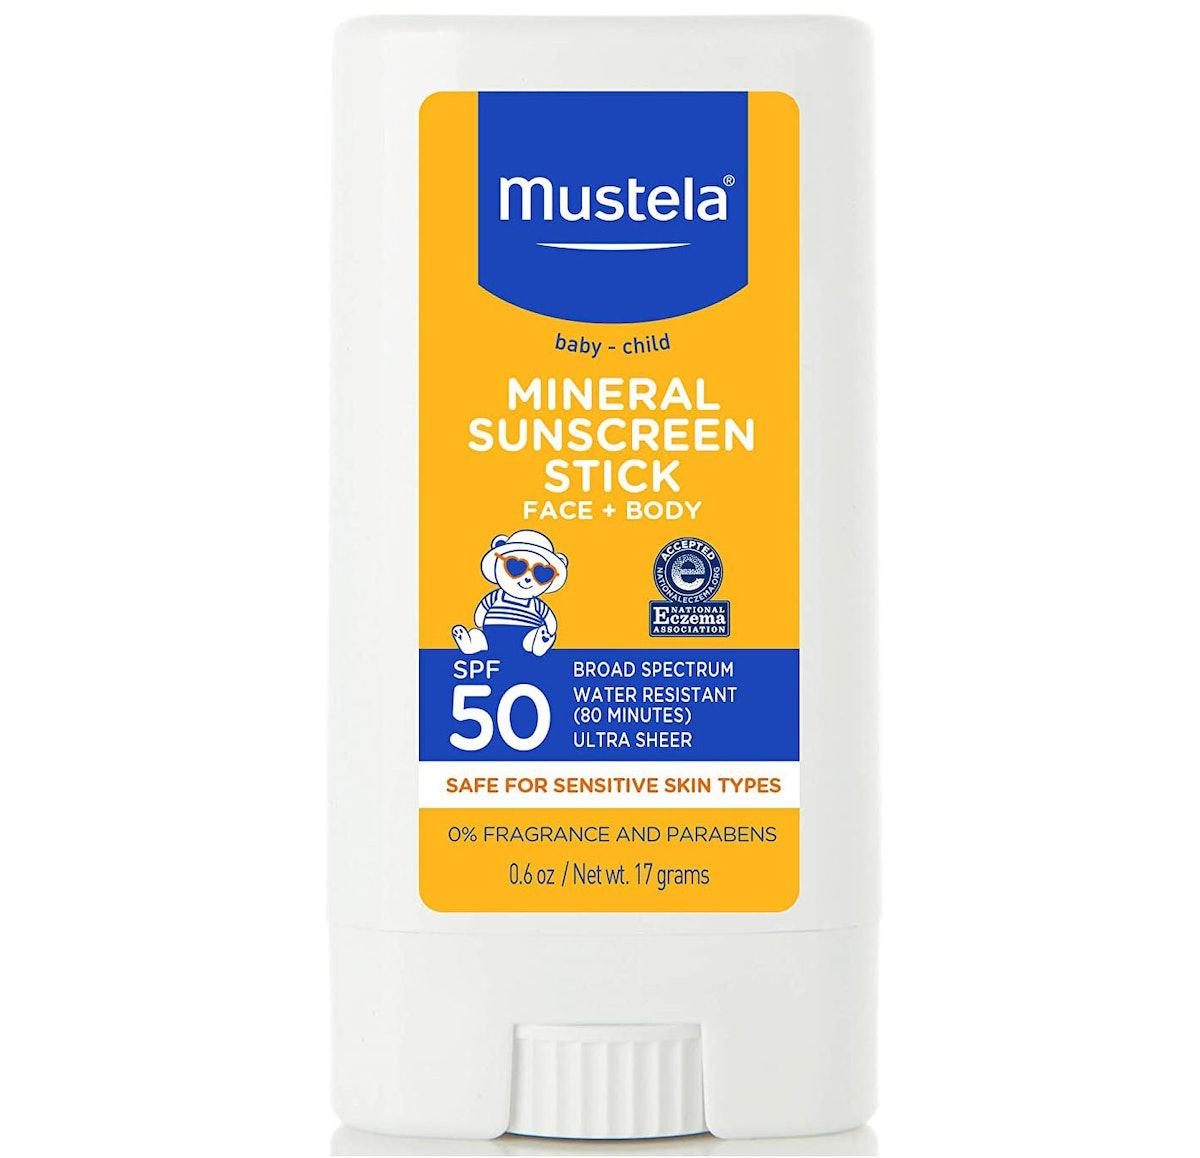 Mustela SPF 50 Mineral Sunscreen Stick